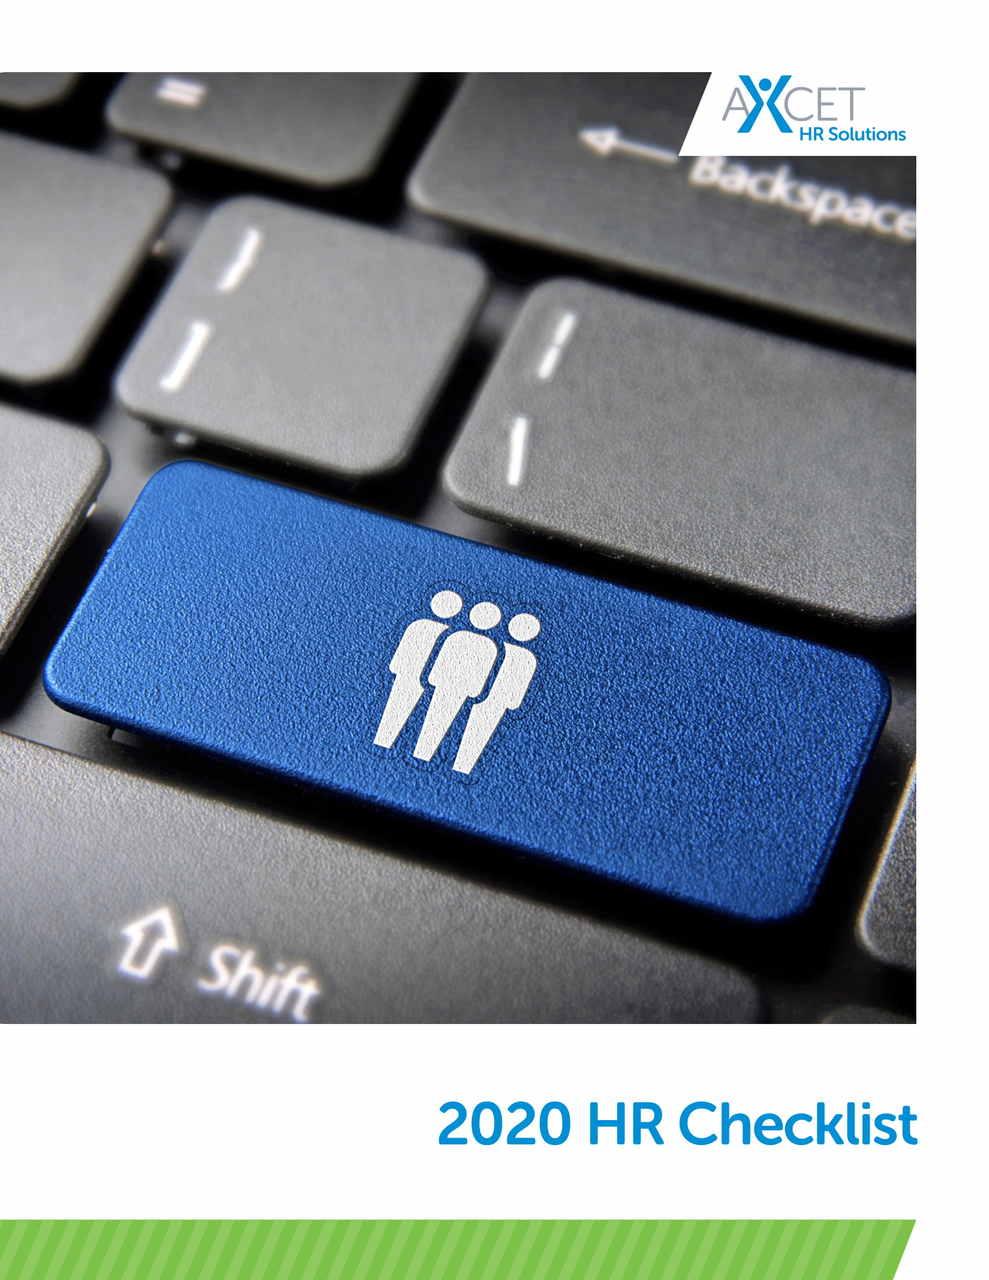 2020 HR Checklist-cover